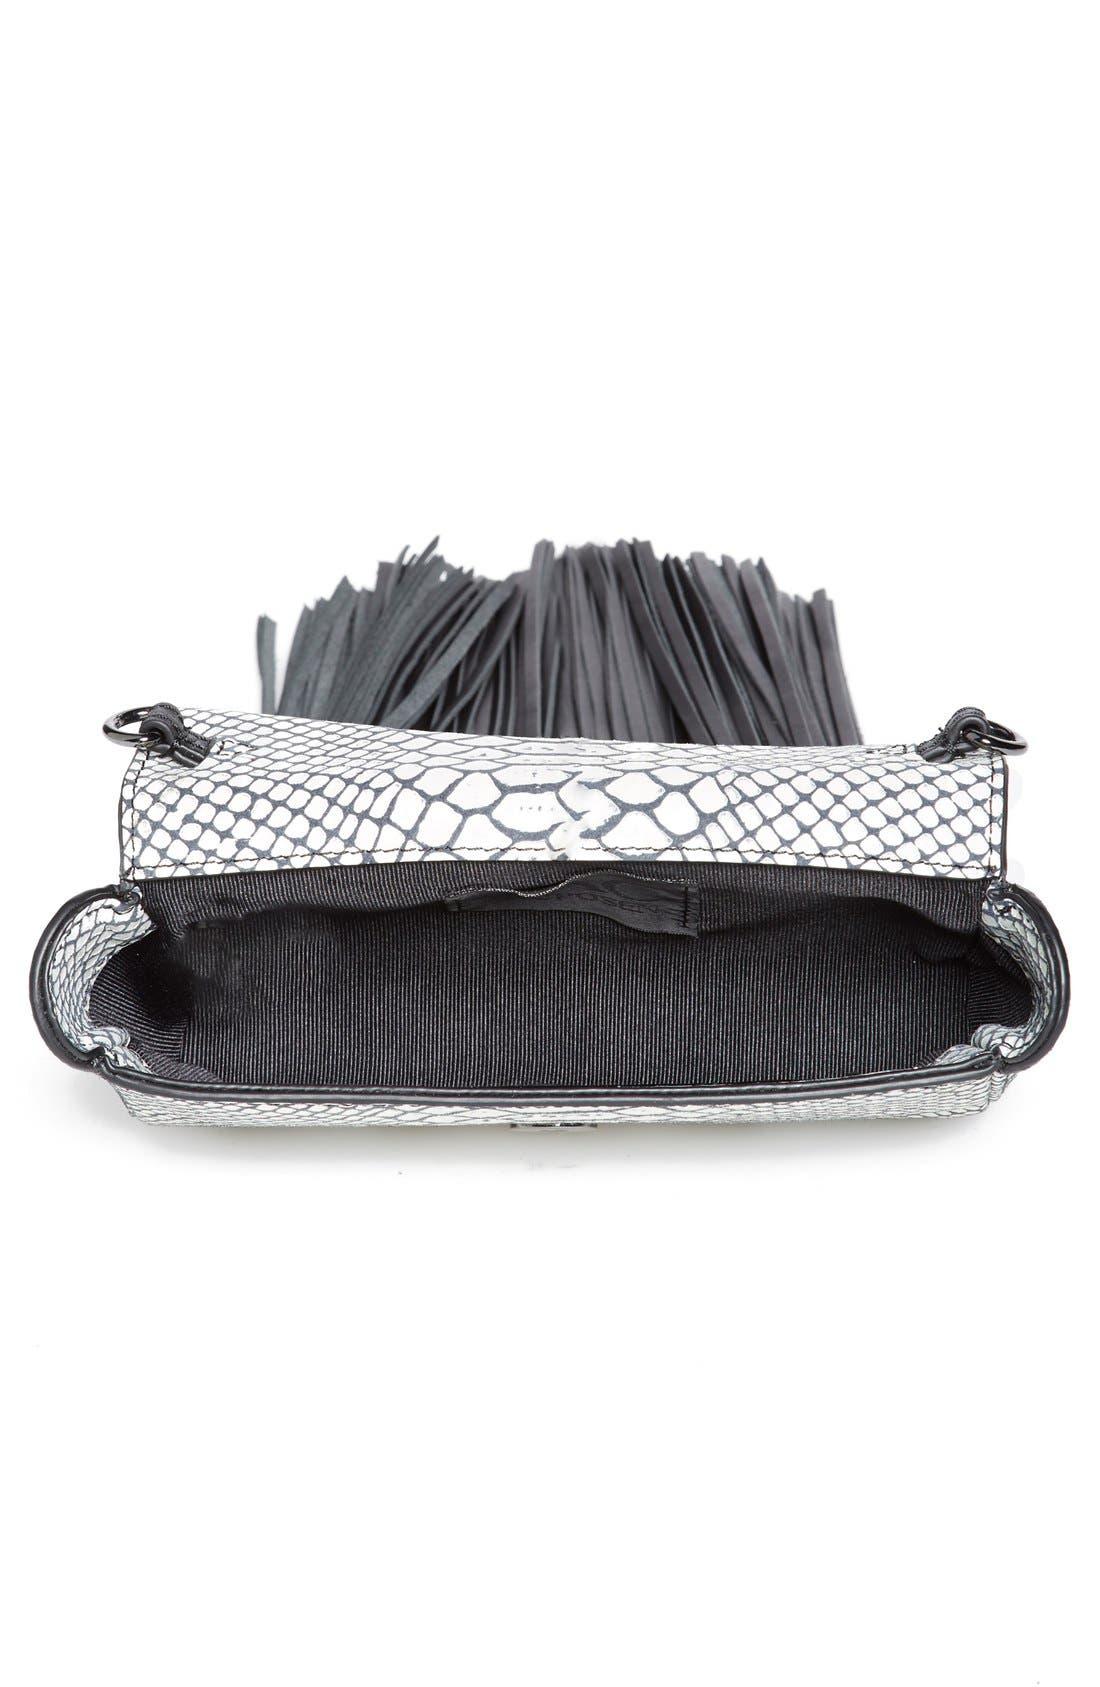 Alternate Image 3  - ZAC Zac Posen 'Claudette' Multi Tassel Flap Clutch